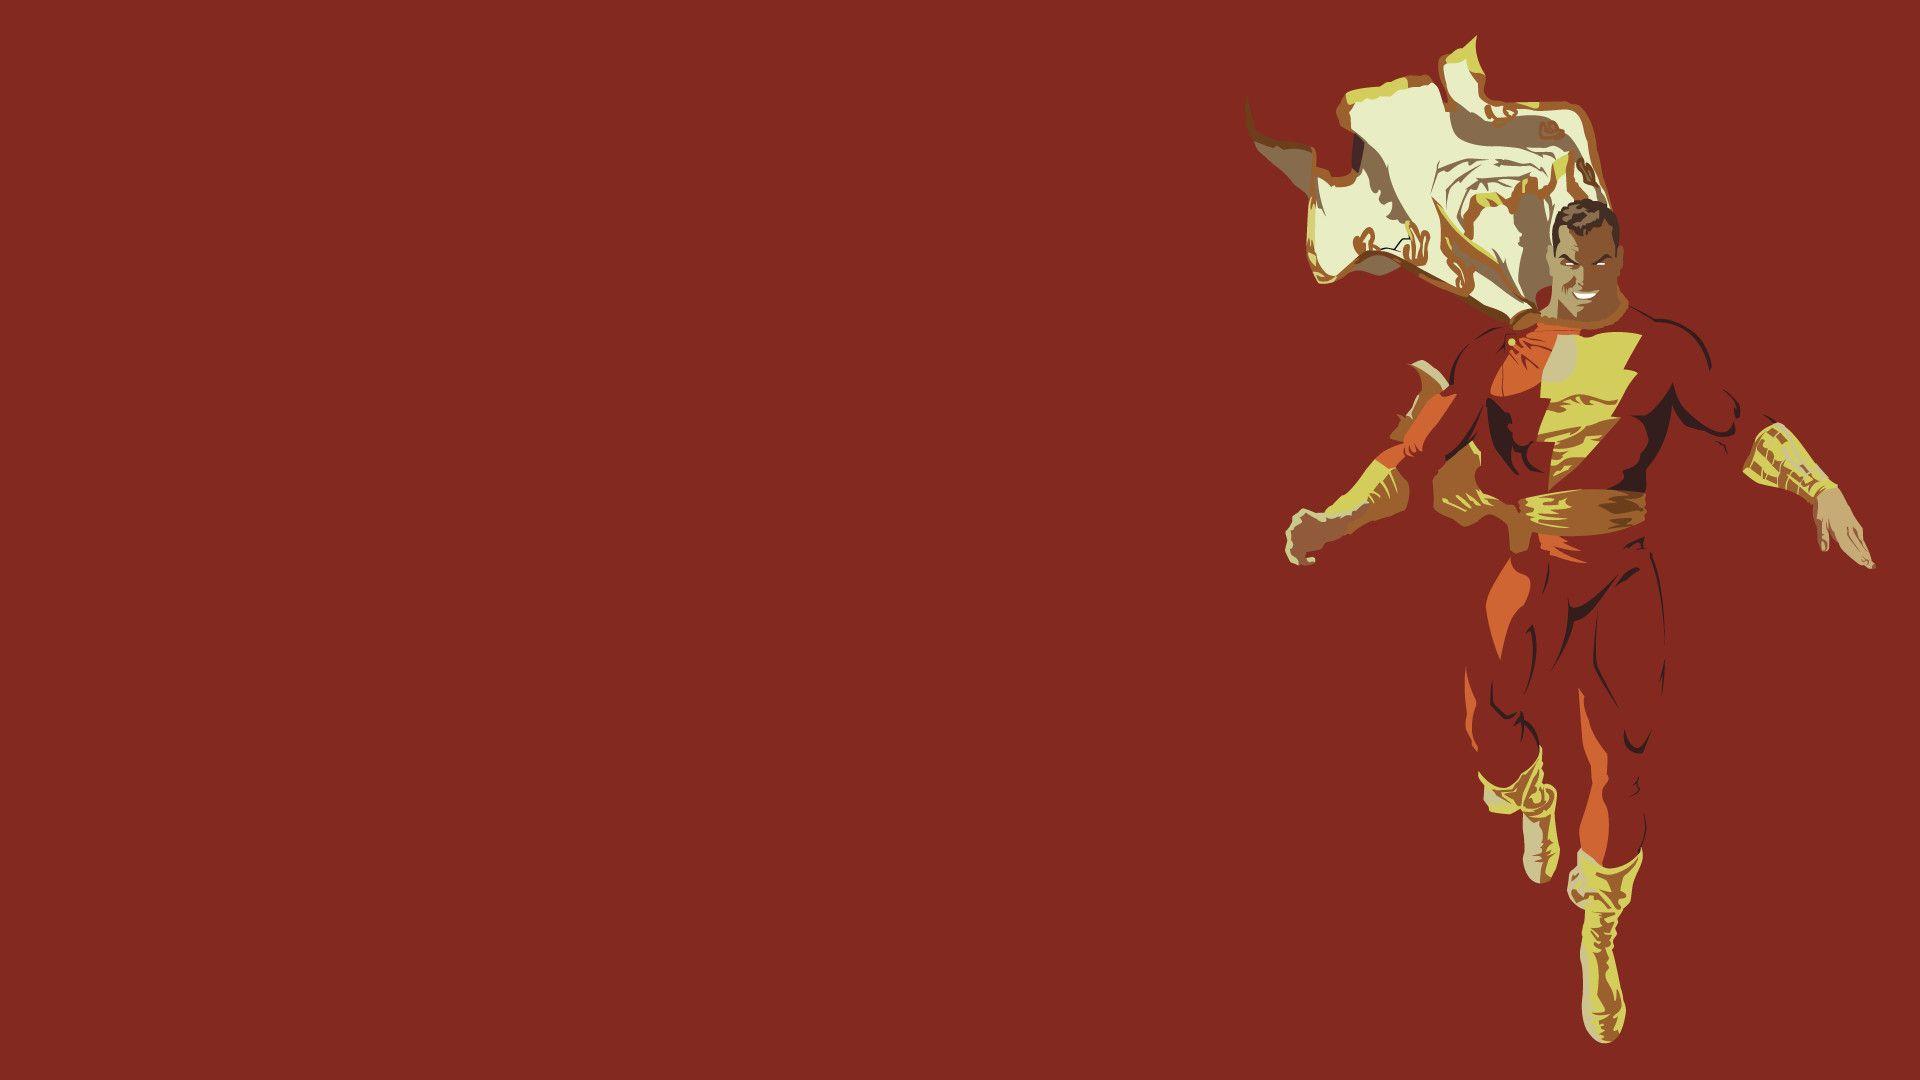 Shazam Wallpapers Top Free Shazam Backgrounds Wallpaperaccess